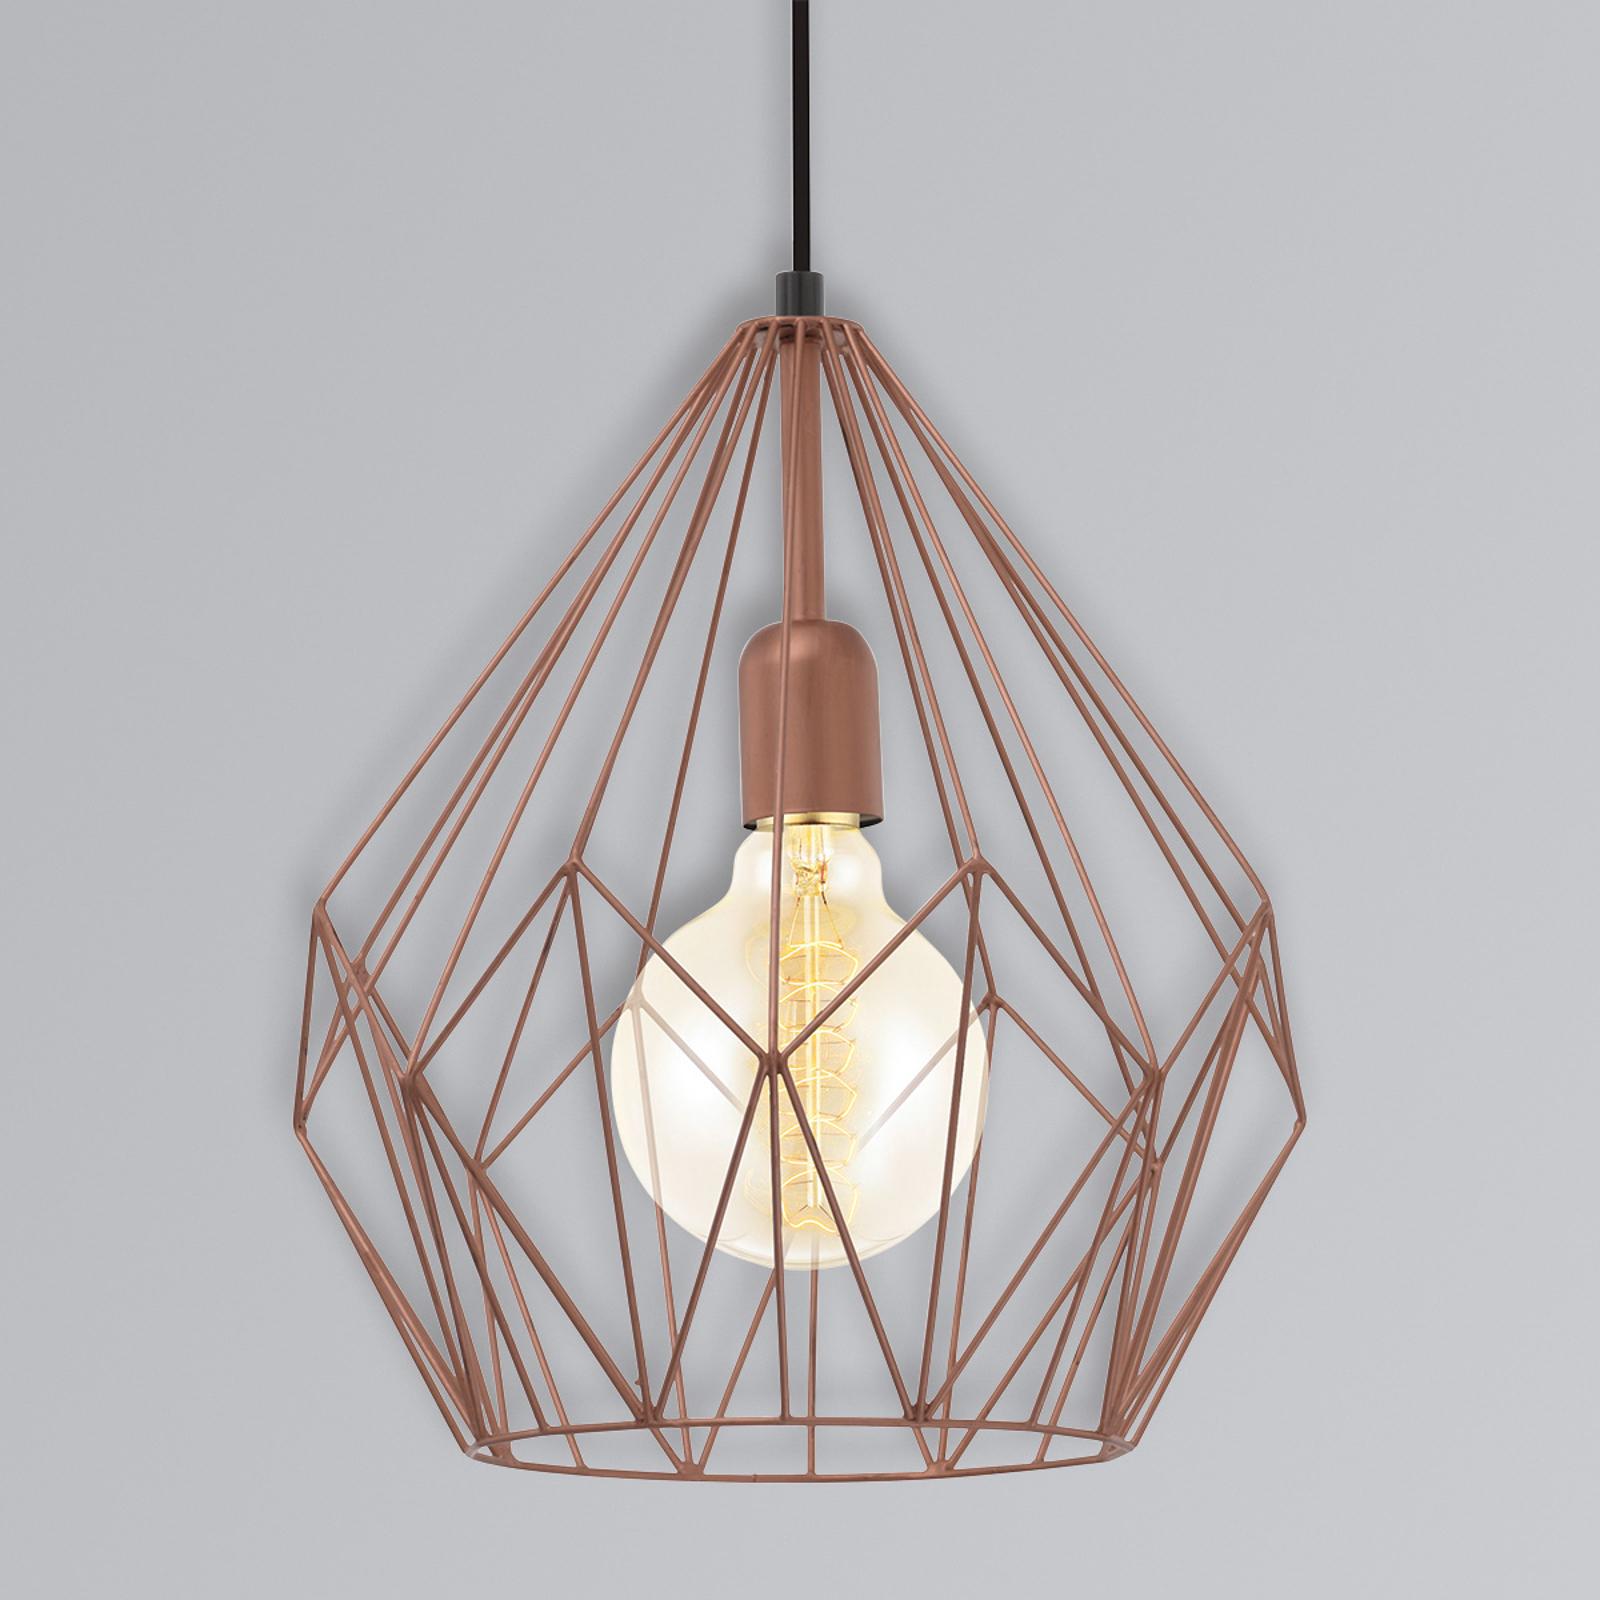 Carlton – lampa wisząca w stylu vintage